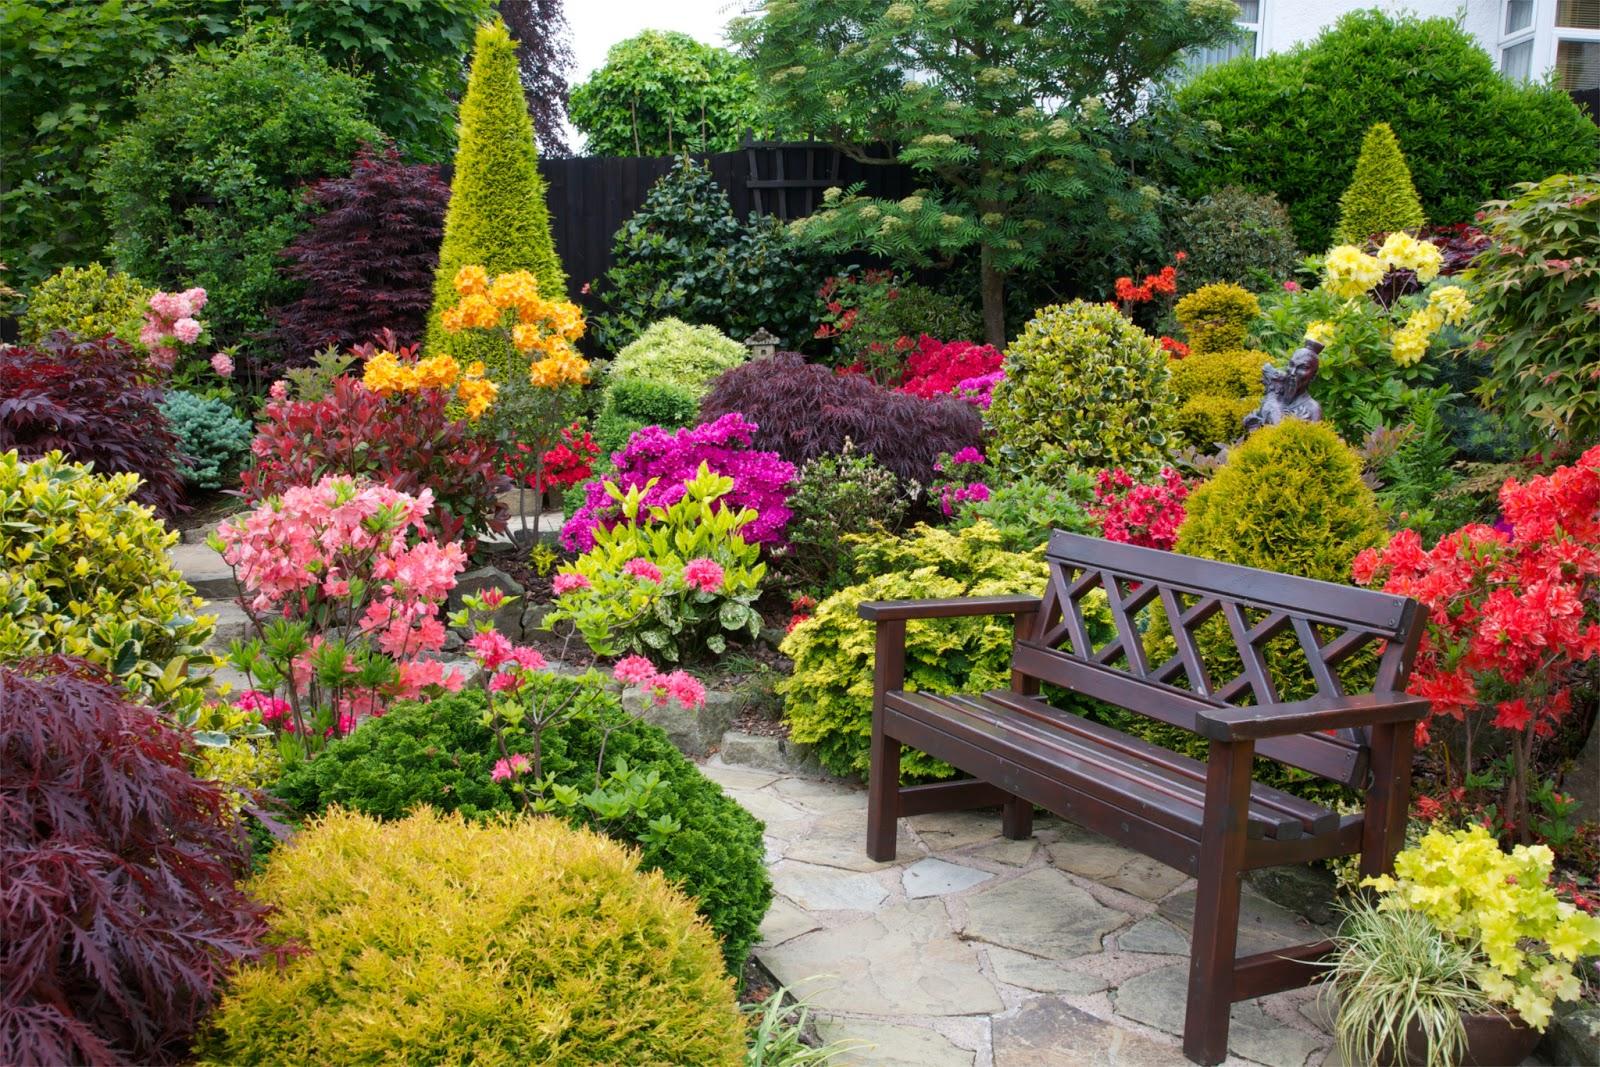 Drelis Gardens: Four Seasons Garden - The most beautiful ...